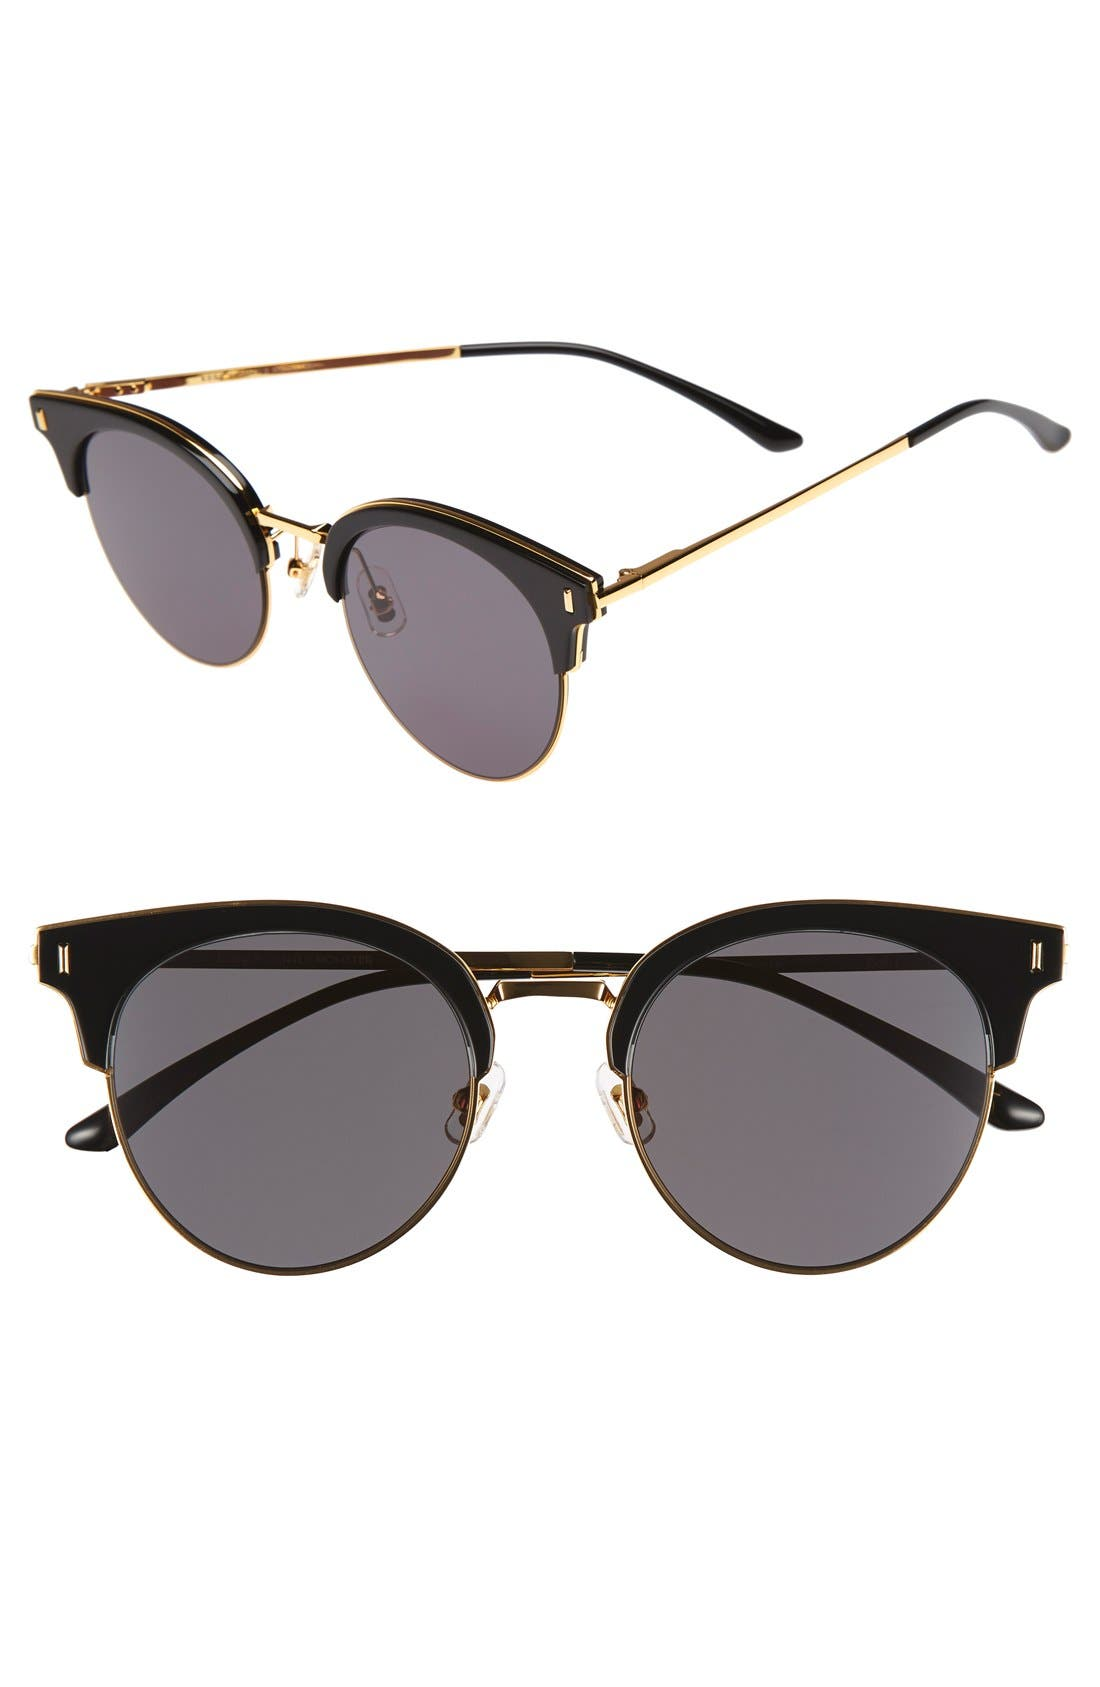 Main Image - Gentle Monster Sunglasses 'Kong Hyo Jin - Type 1' 58mm Sunglasses